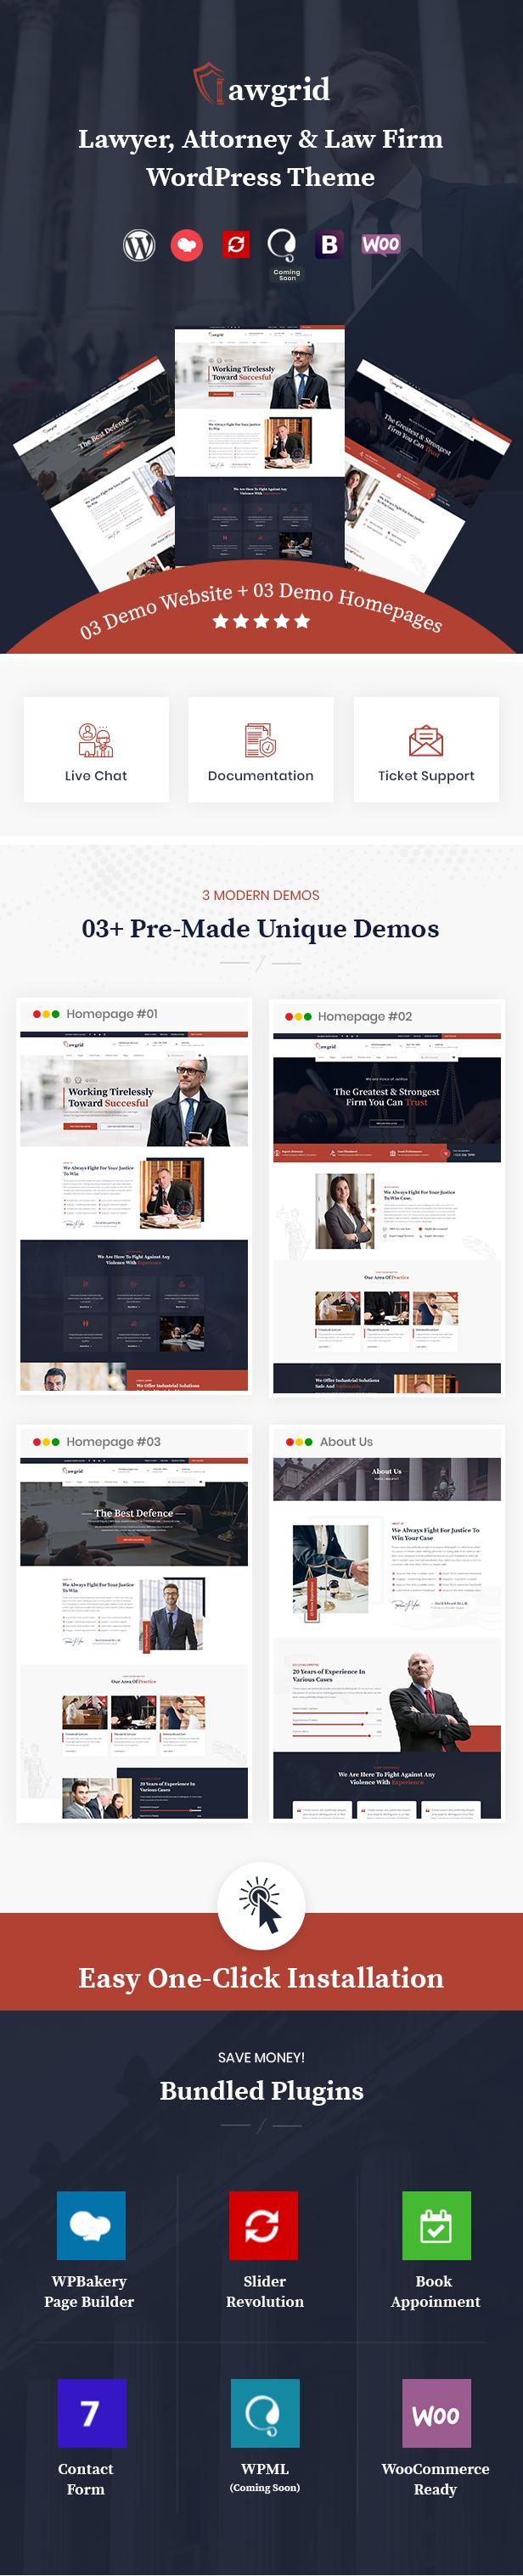 Lawgrid WordPress Thème